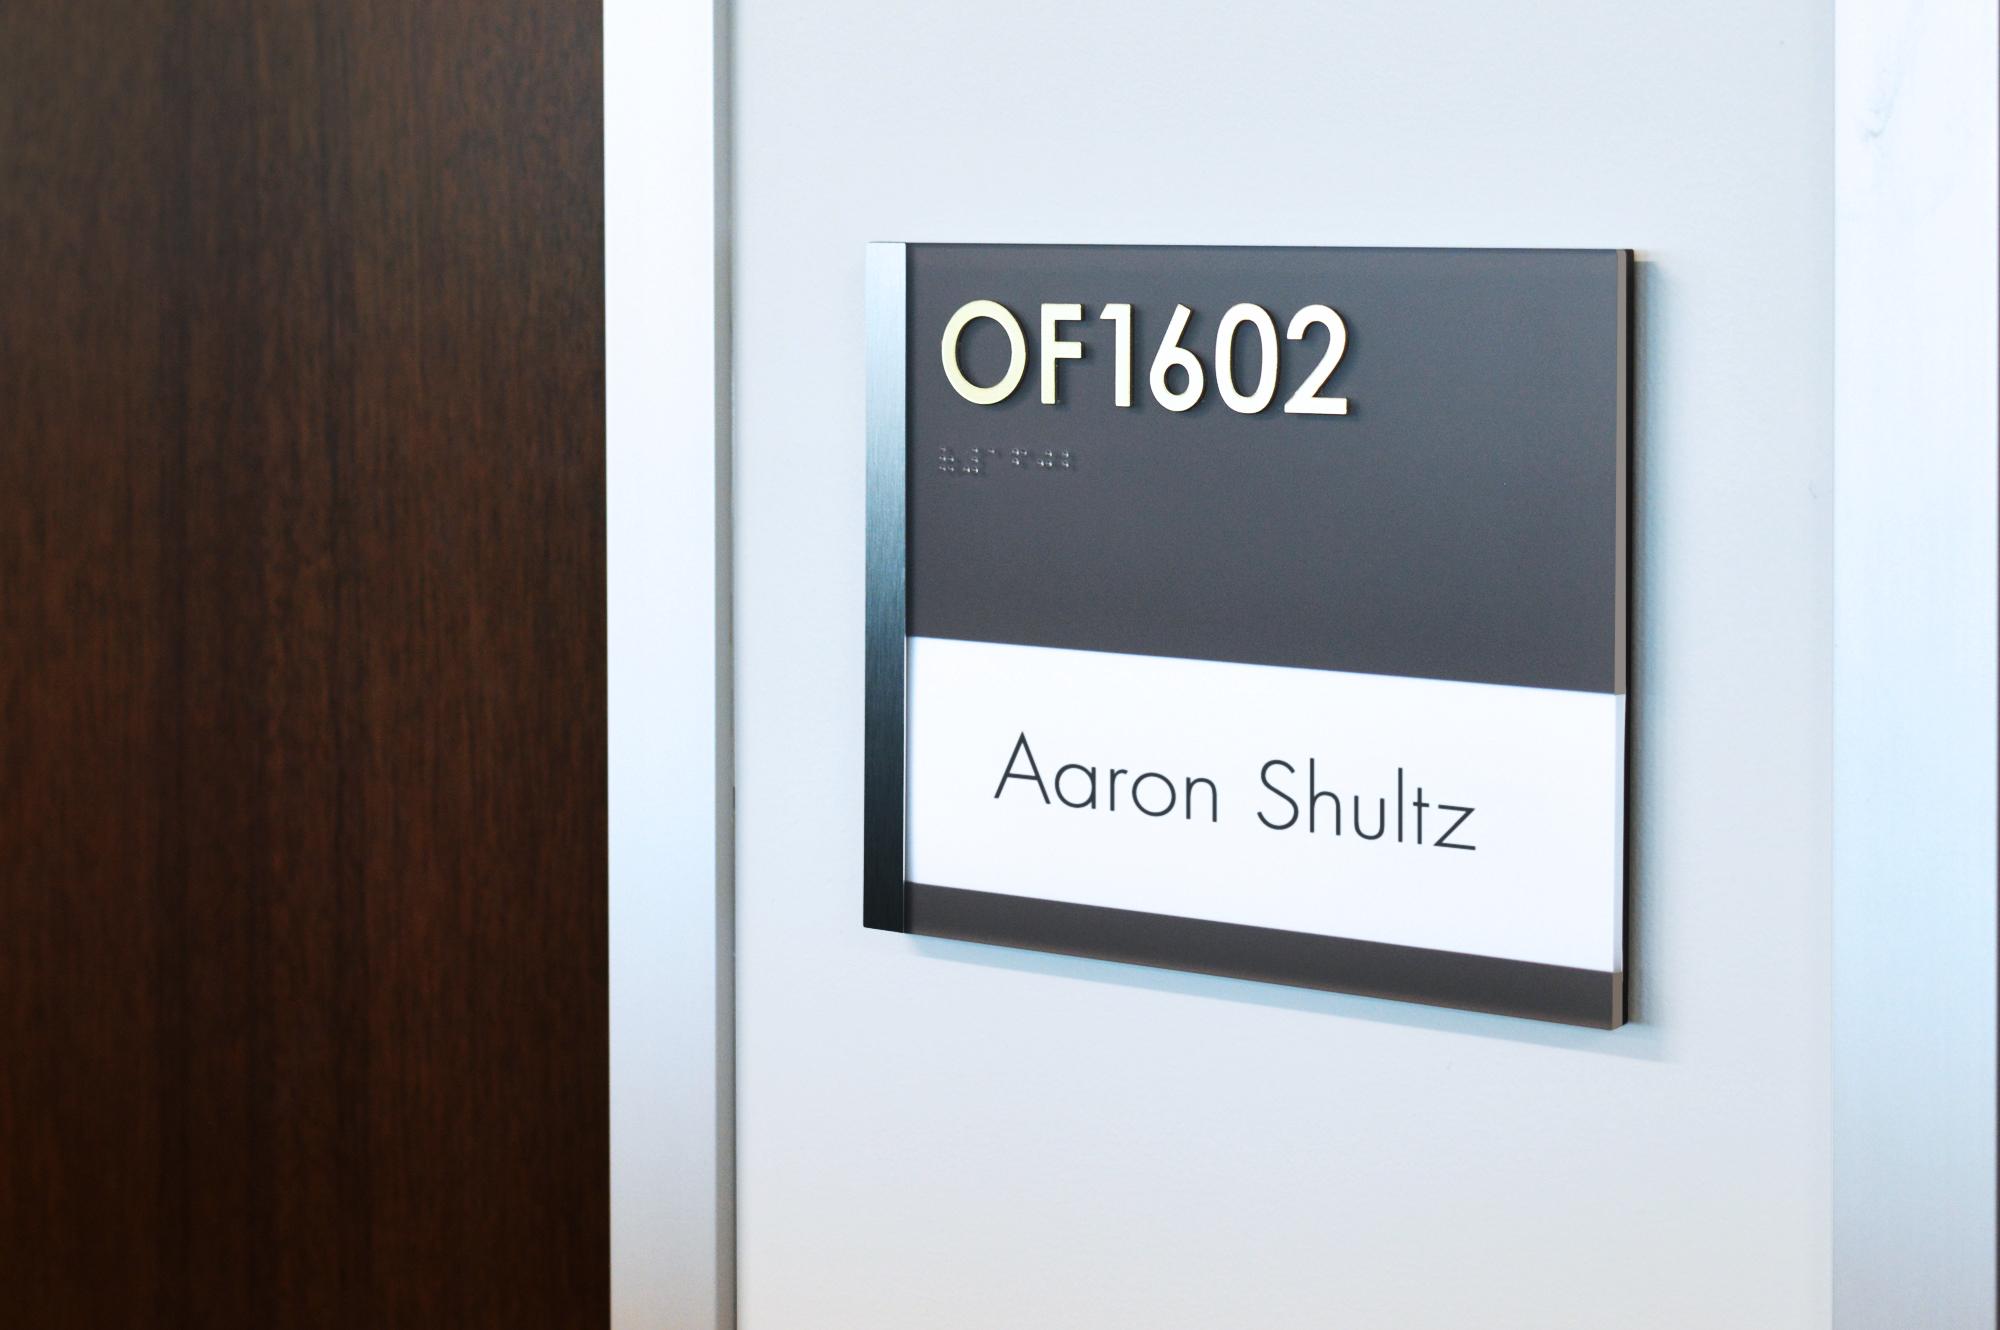 Photo of Room ID